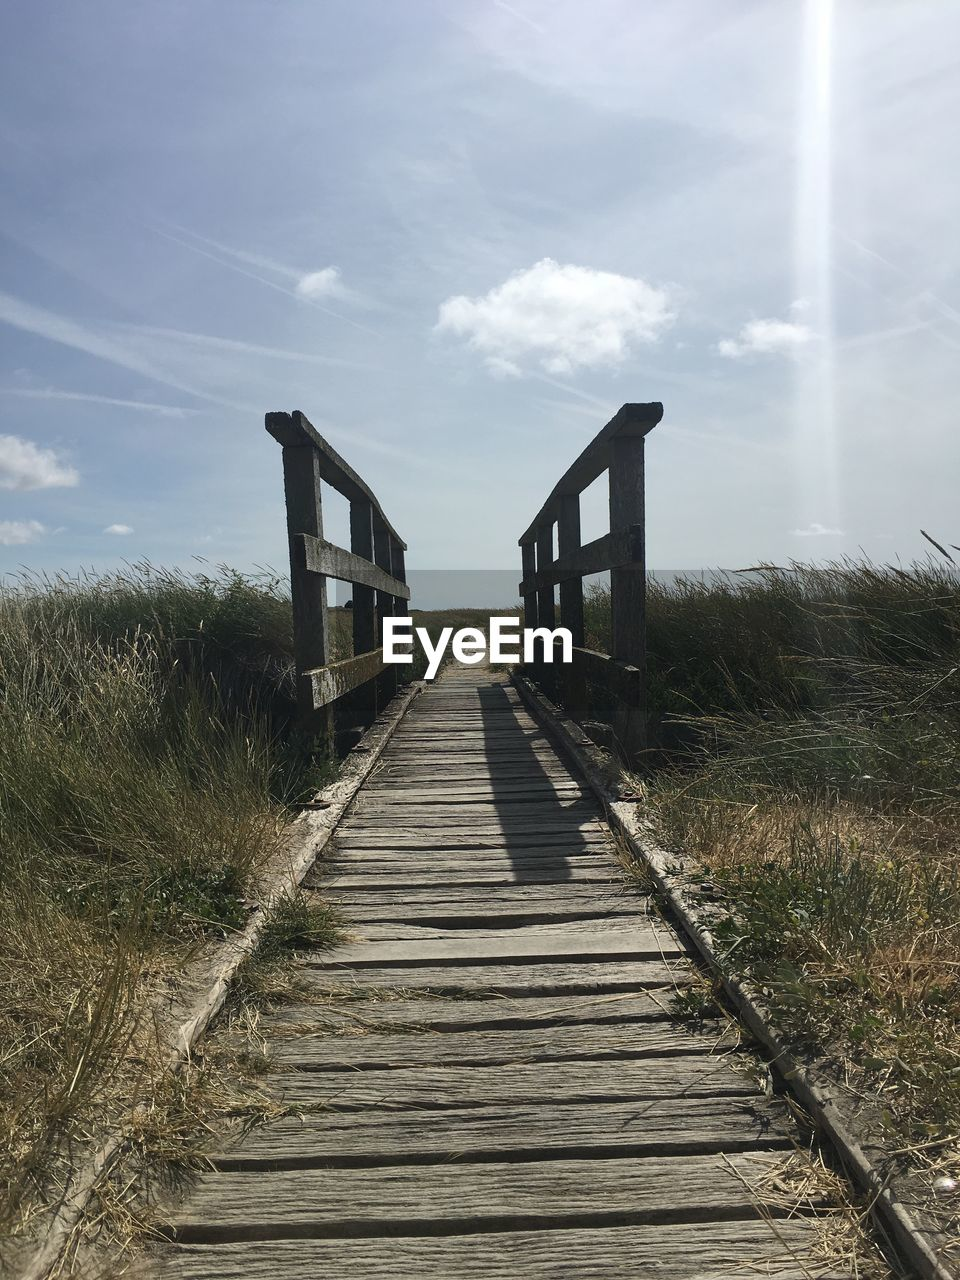 Boardwalk Leading Towards Built Structure Against Sky